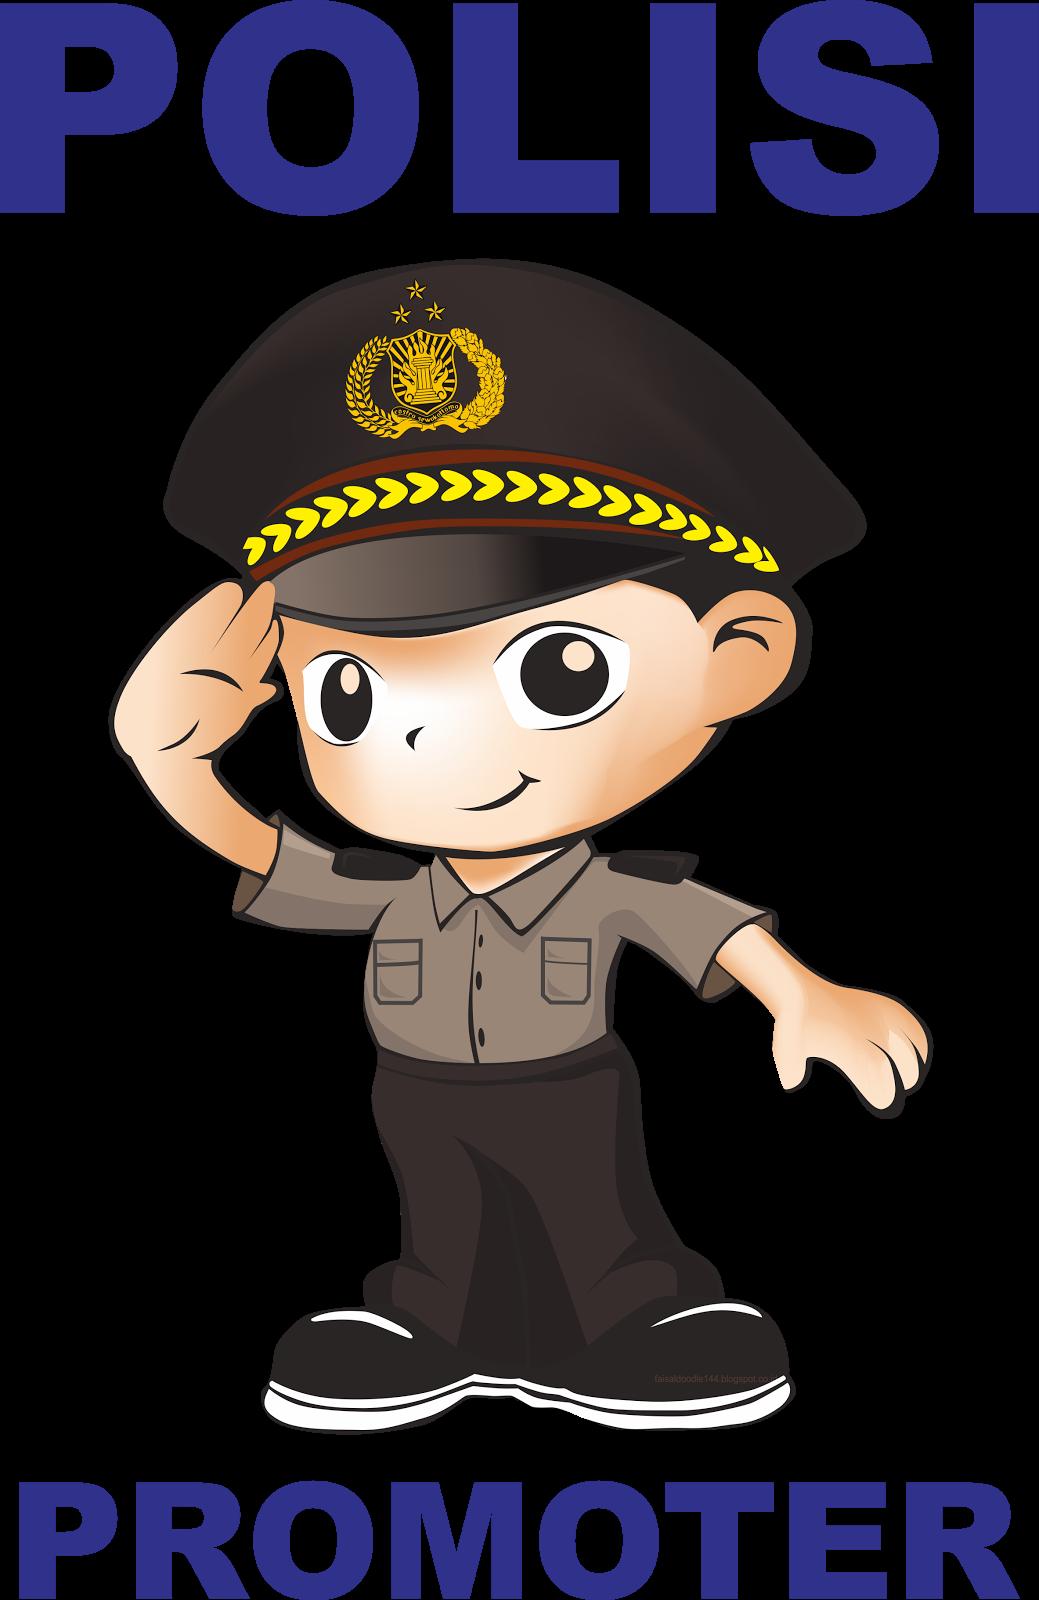 Koleksi Gambar Animasi Foto Terbaru 2018 Sapawarga